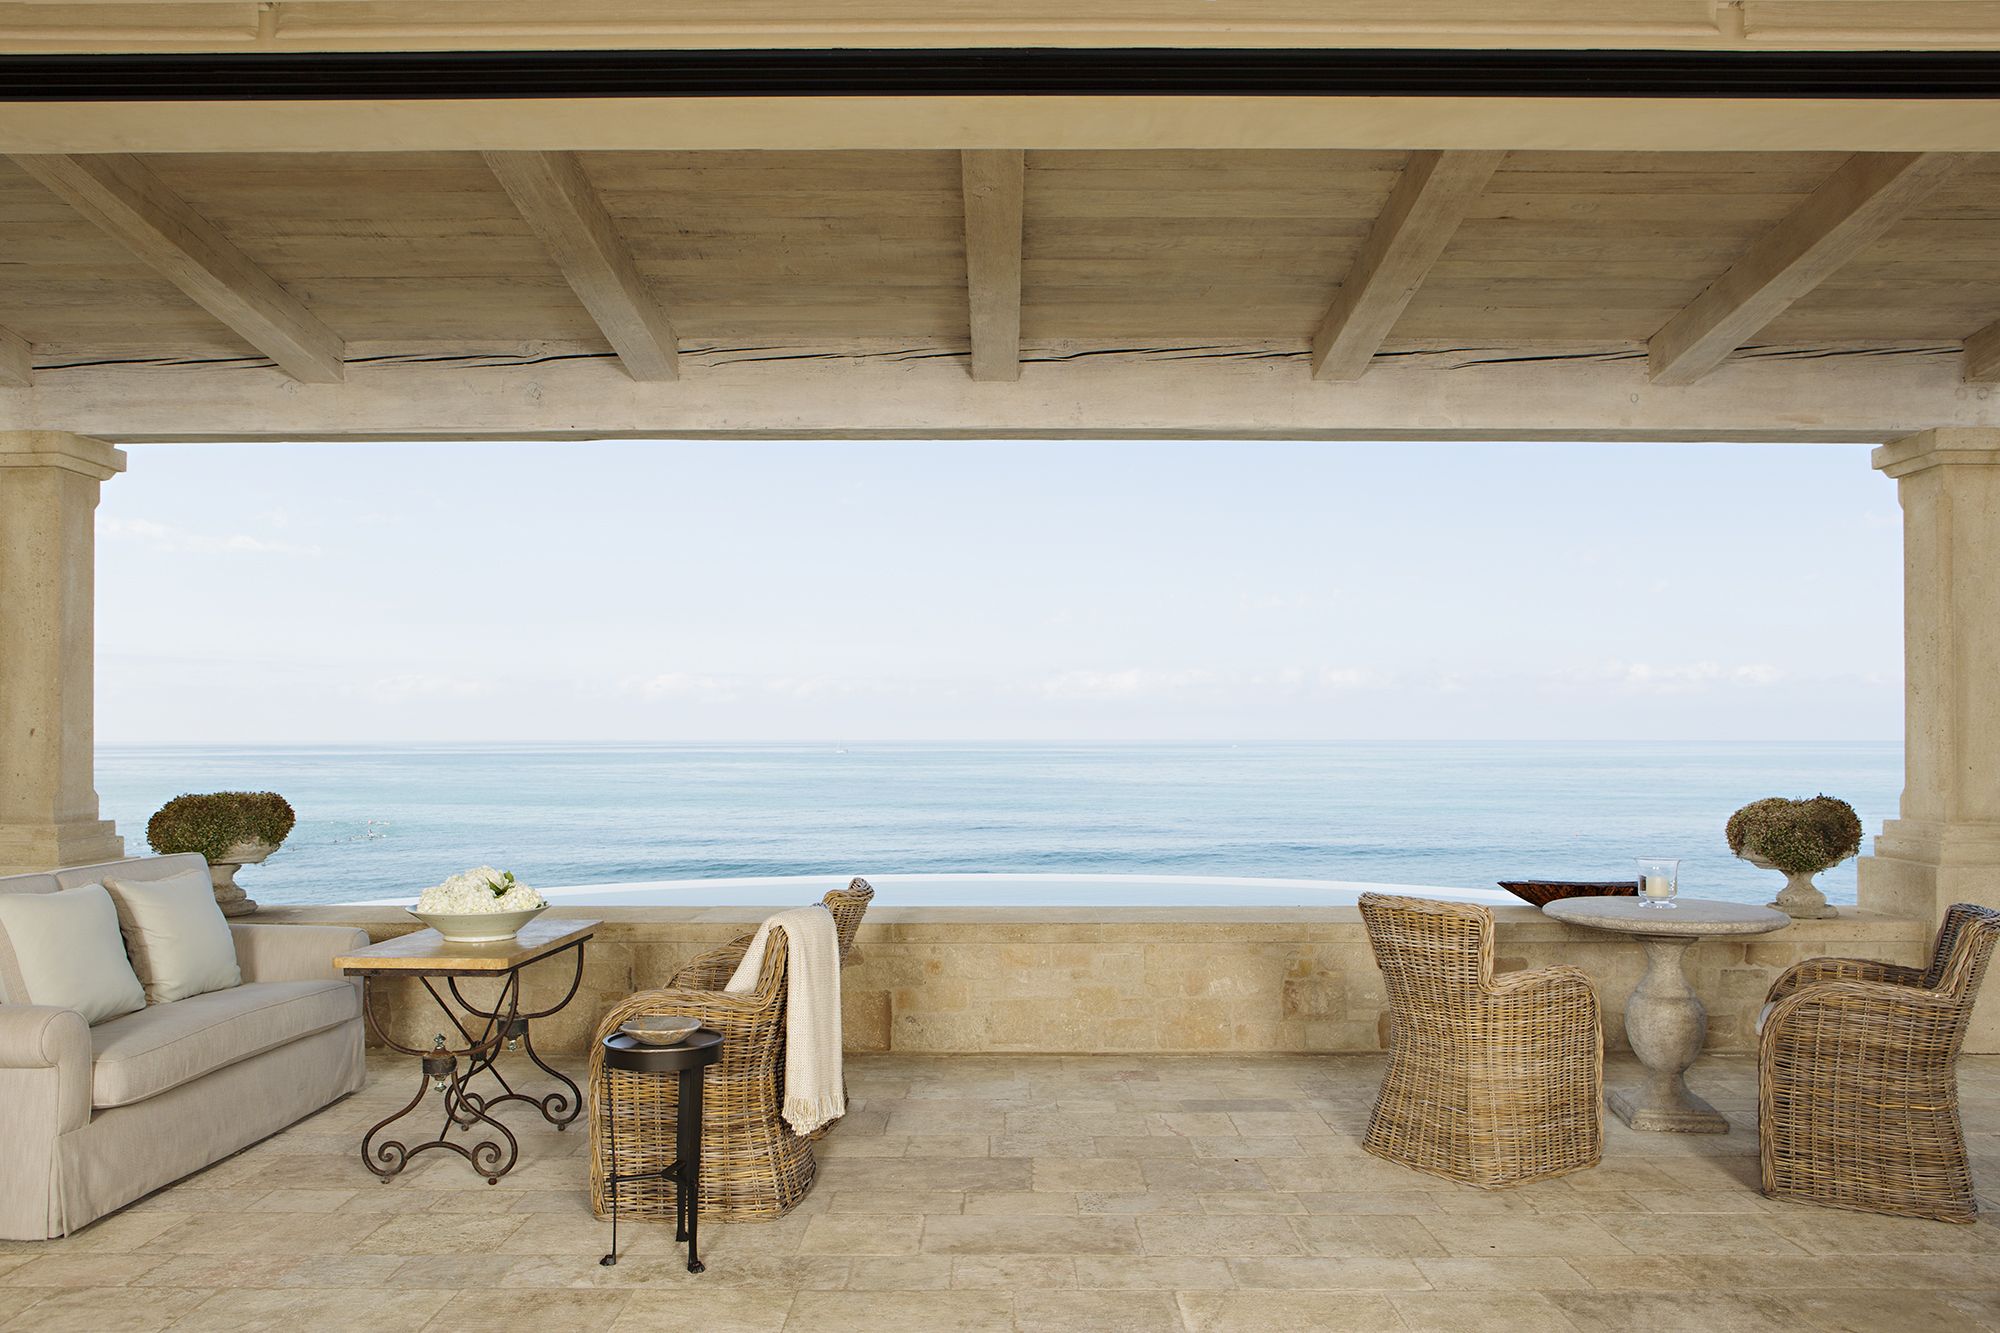 STRAND BEACH - PROVENCE BEACH HOUSE BALCONY BY OATMAN ARCHITECTS